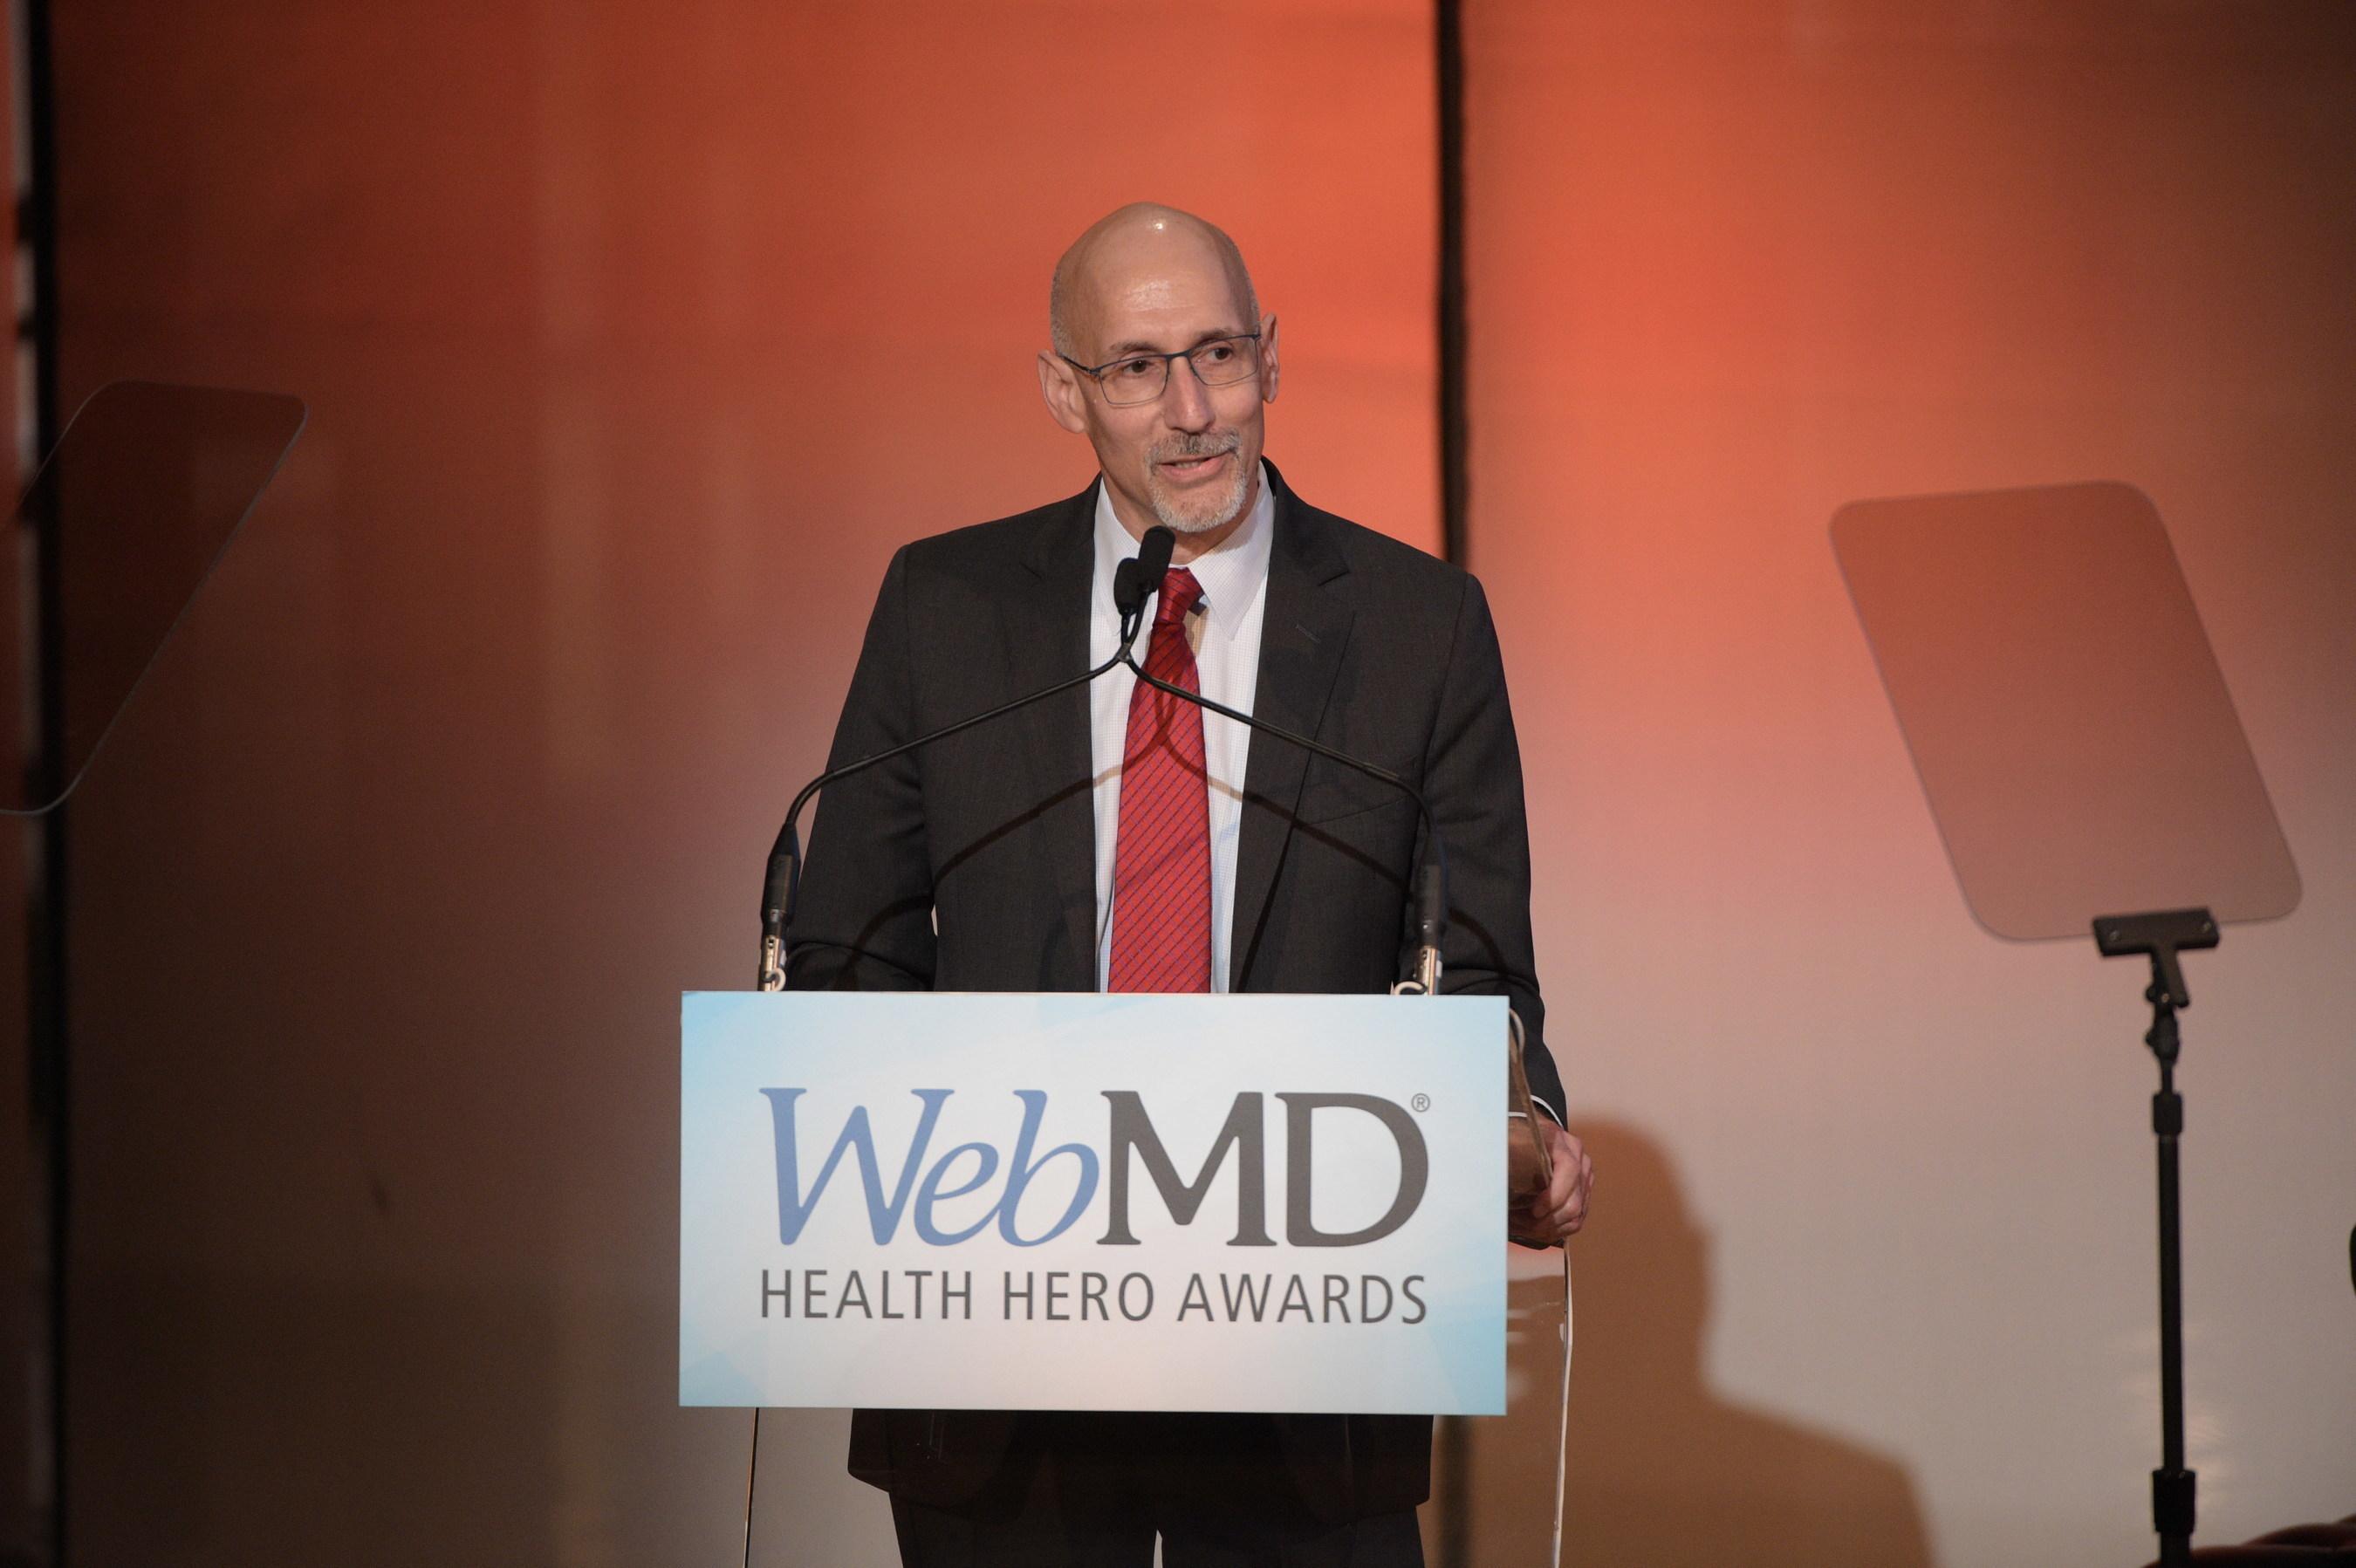 Steve Zatz, MD, WebMD CEO kicks-off the 2016 WebMD Health Hero Awards Ceremony on November 3, 2016 in New York City.